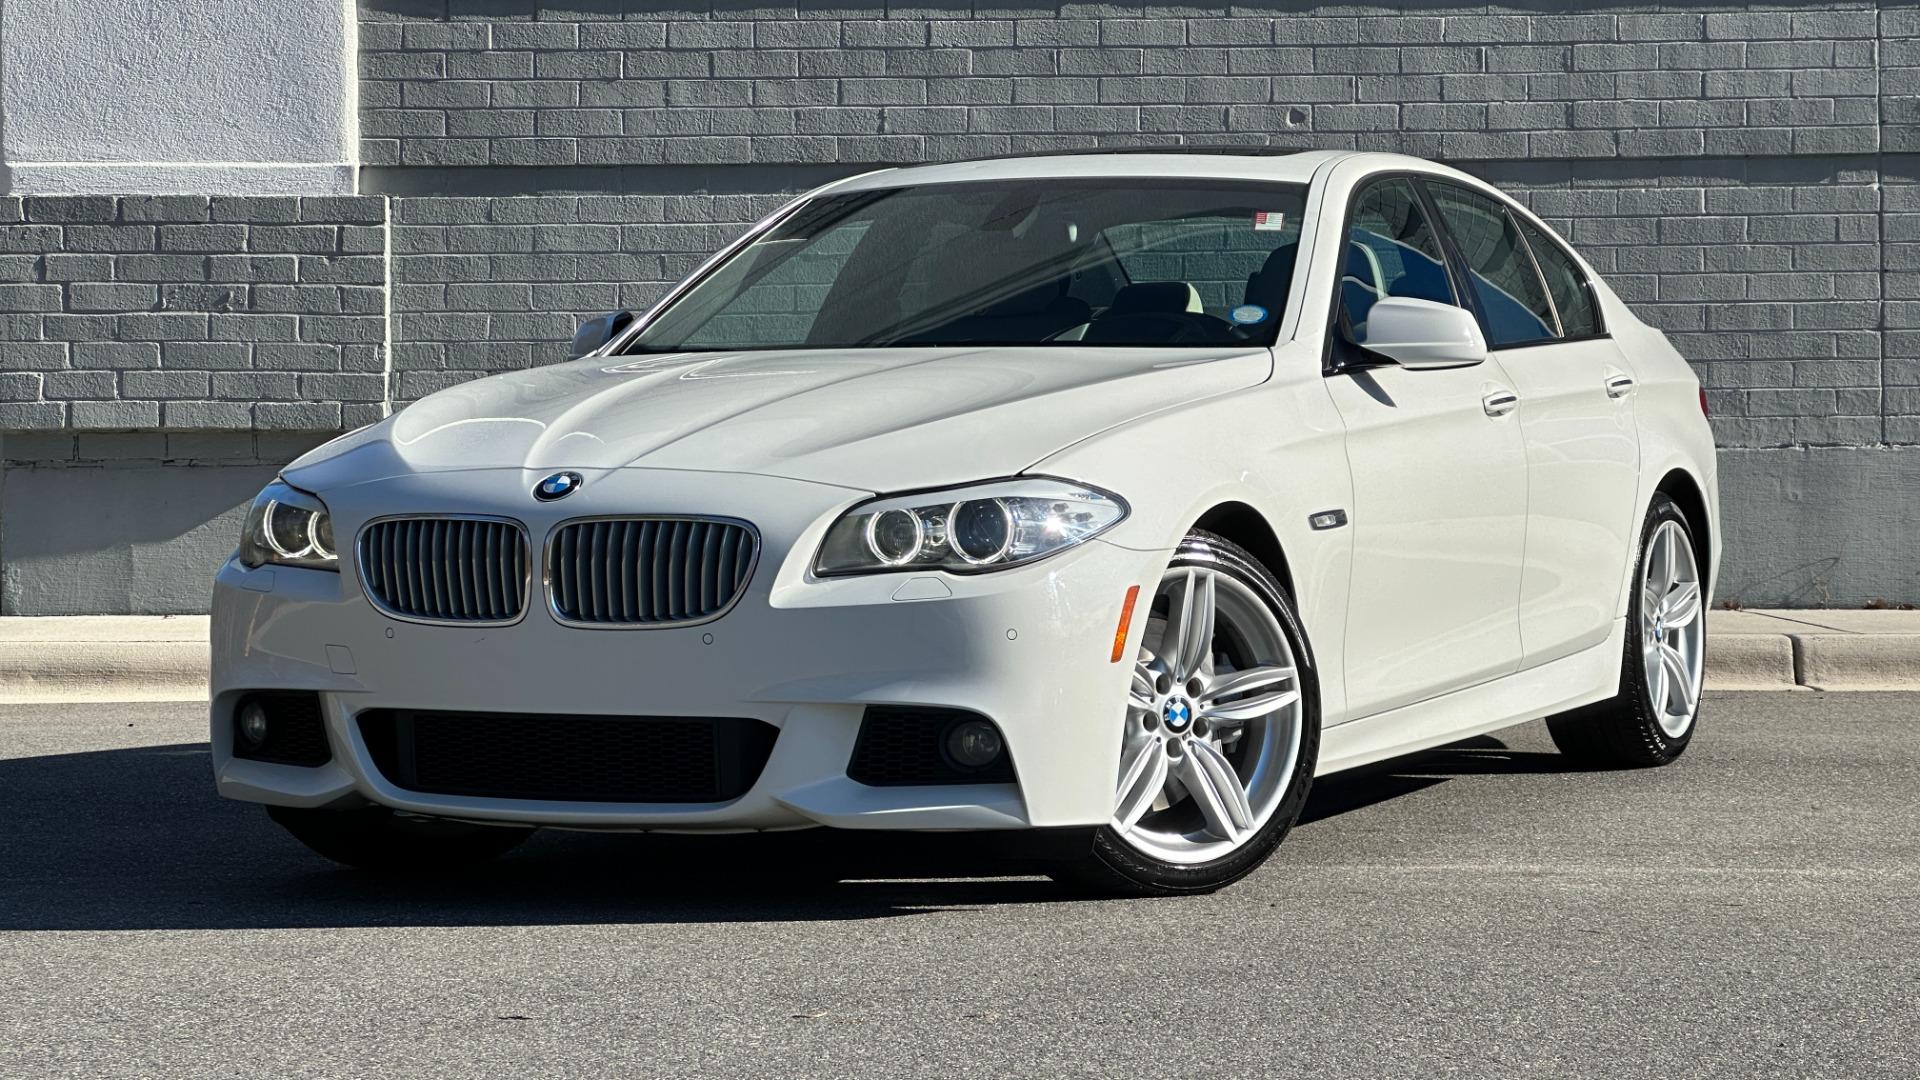 Used 2012 BMW 5 SERIES 550I M SPORT / NAV / CONV PKG / SUNROOF / PREM SND / REARVIEW for sale Sold at Formula Imports in Charlotte NC 28227 1